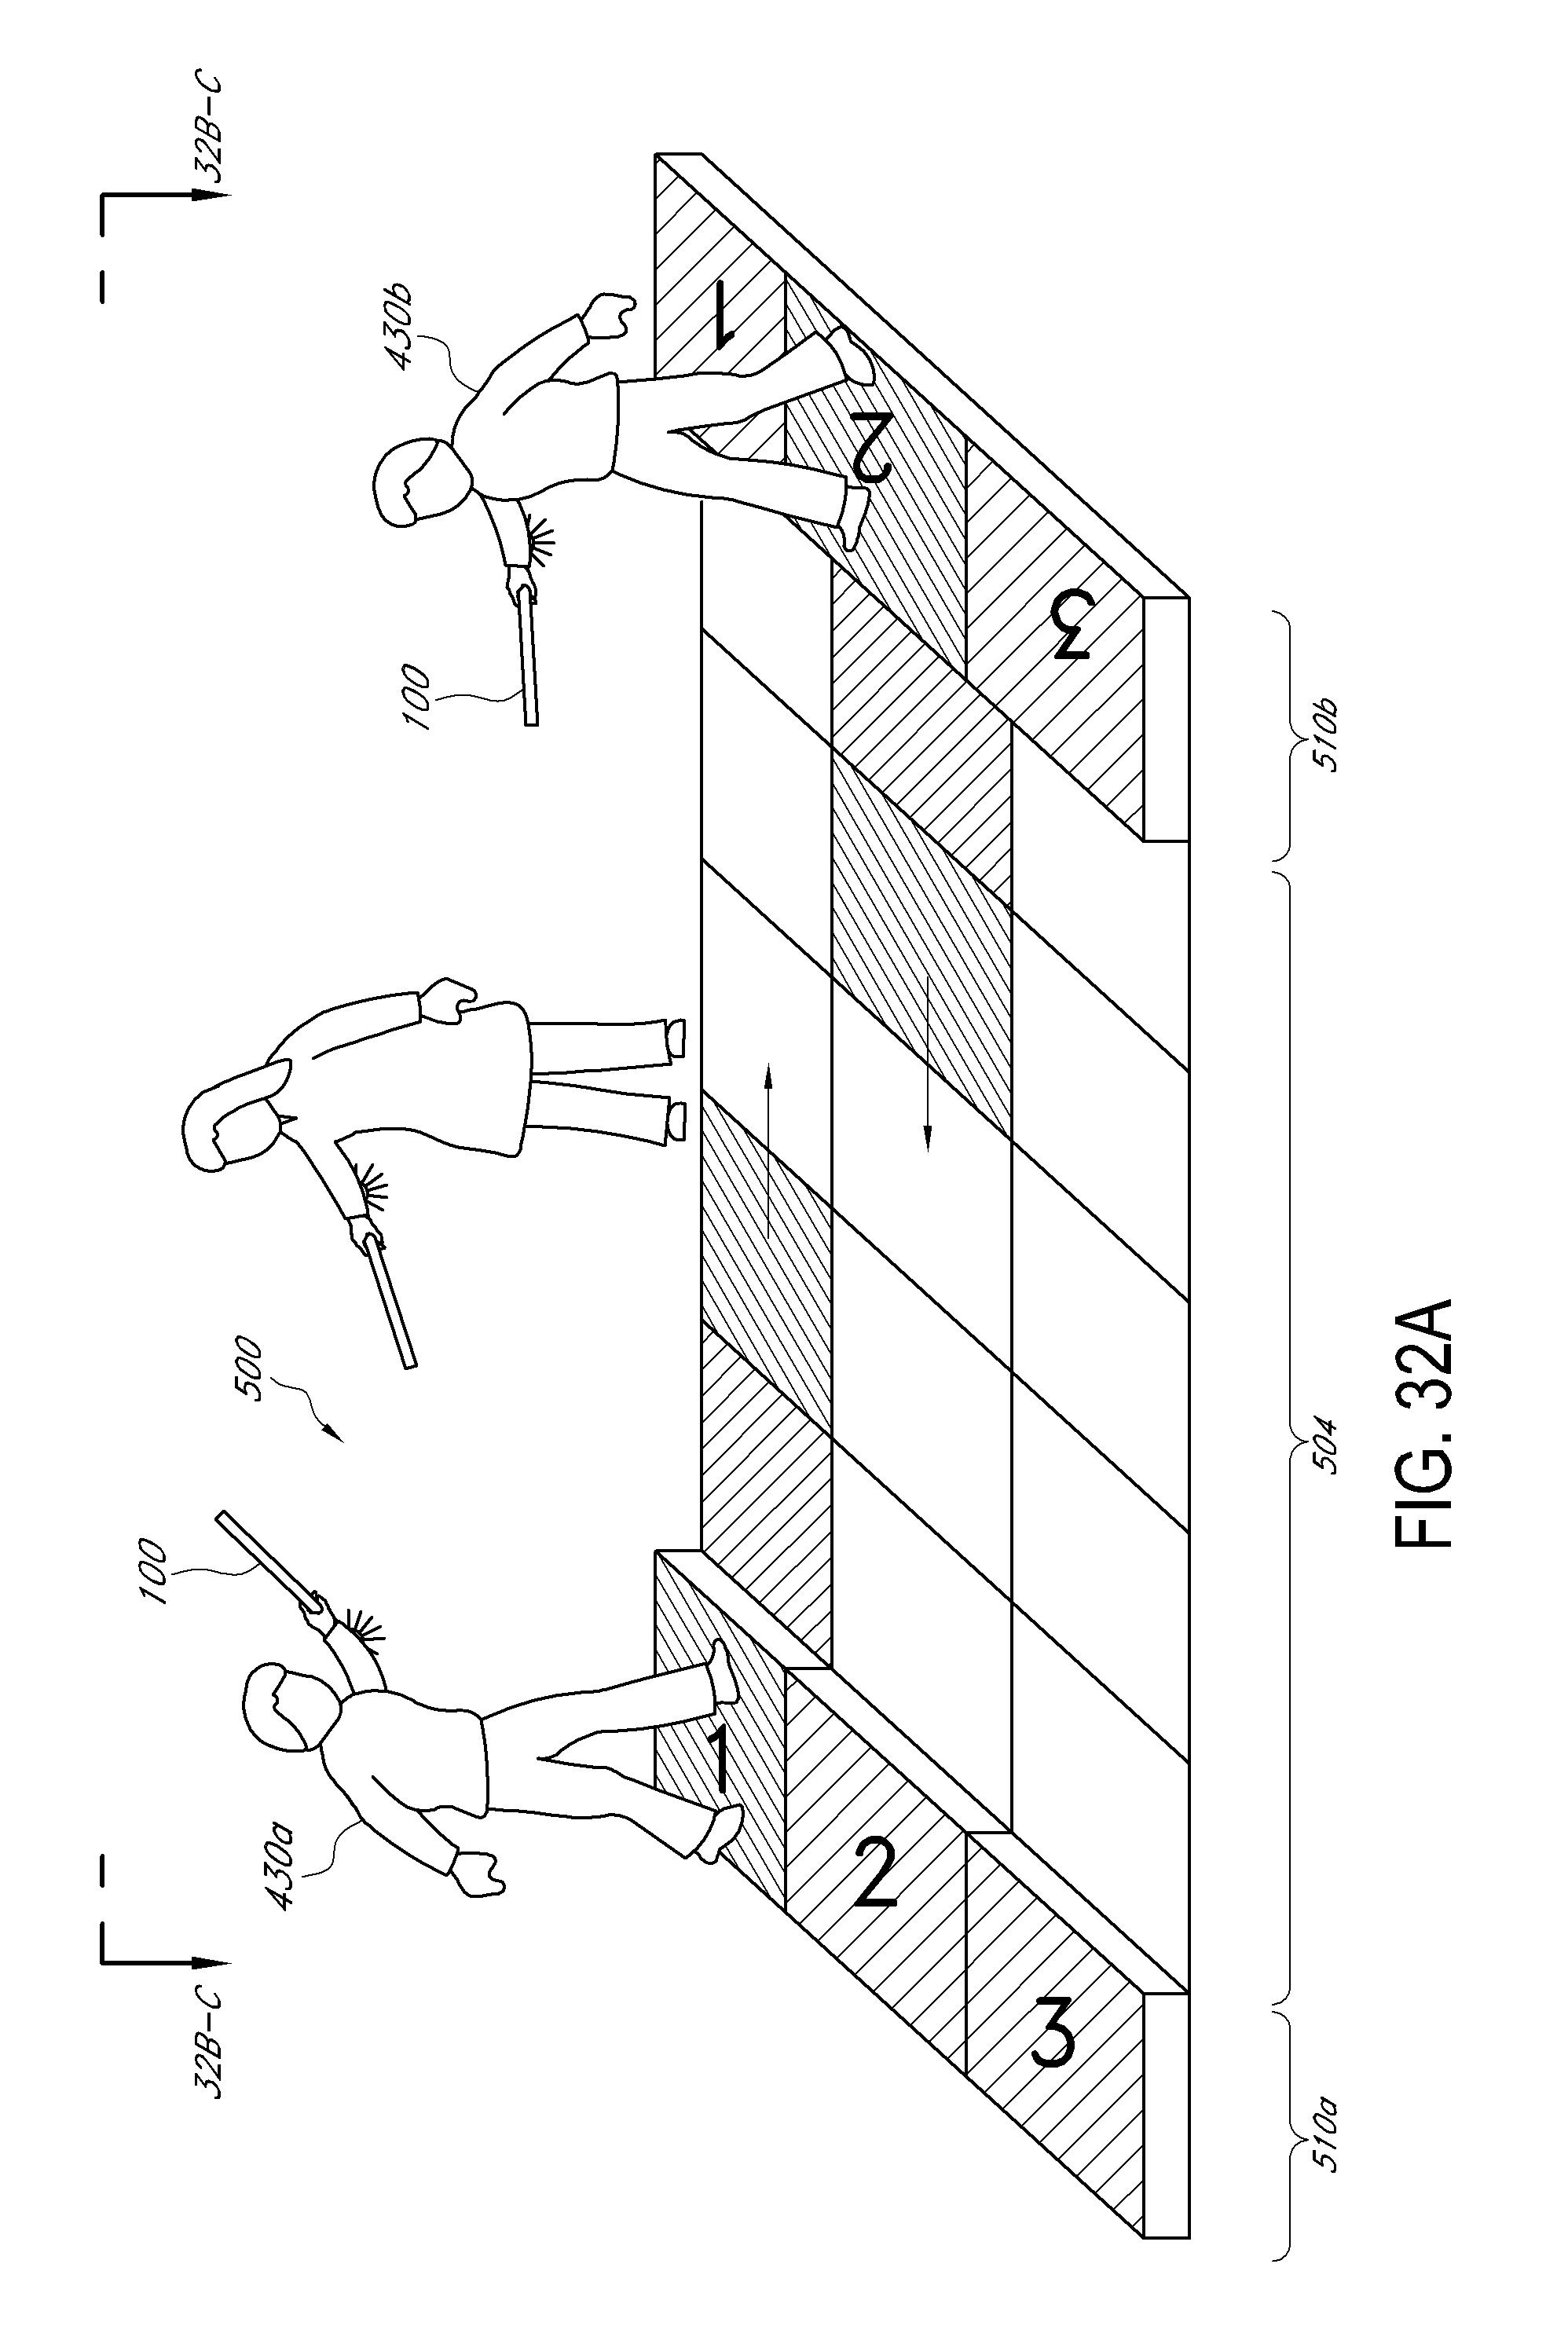 Patent US 8,475,275 B2